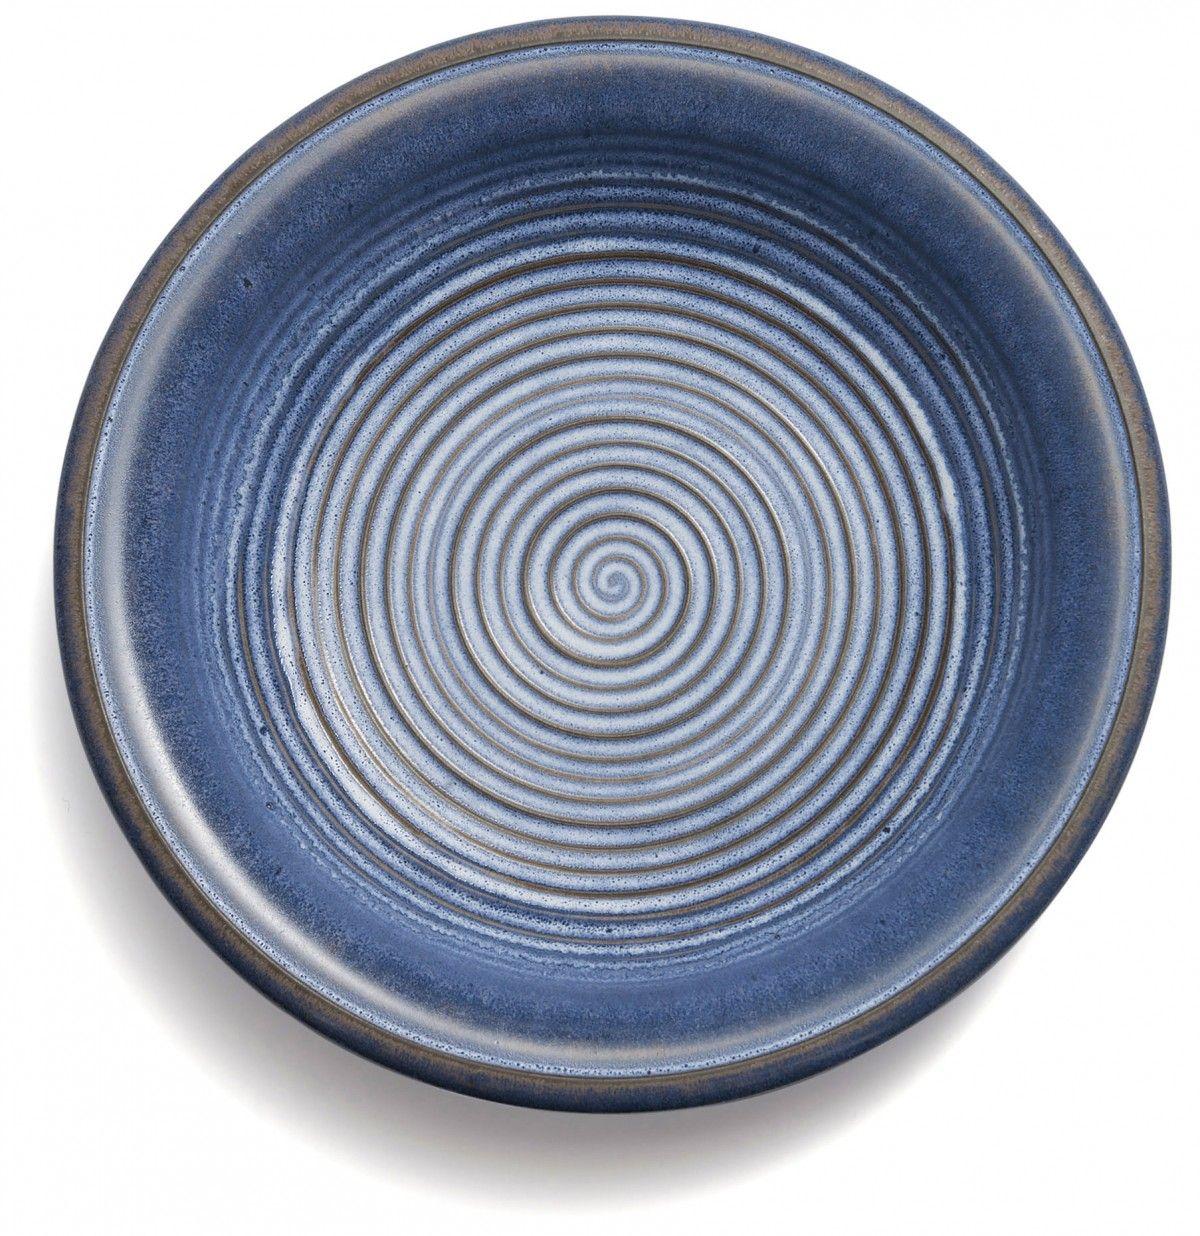 Coroa Bowl, 40cm, Blue - Montefeltro - David Mellor Design #craft #handmade #ceramics